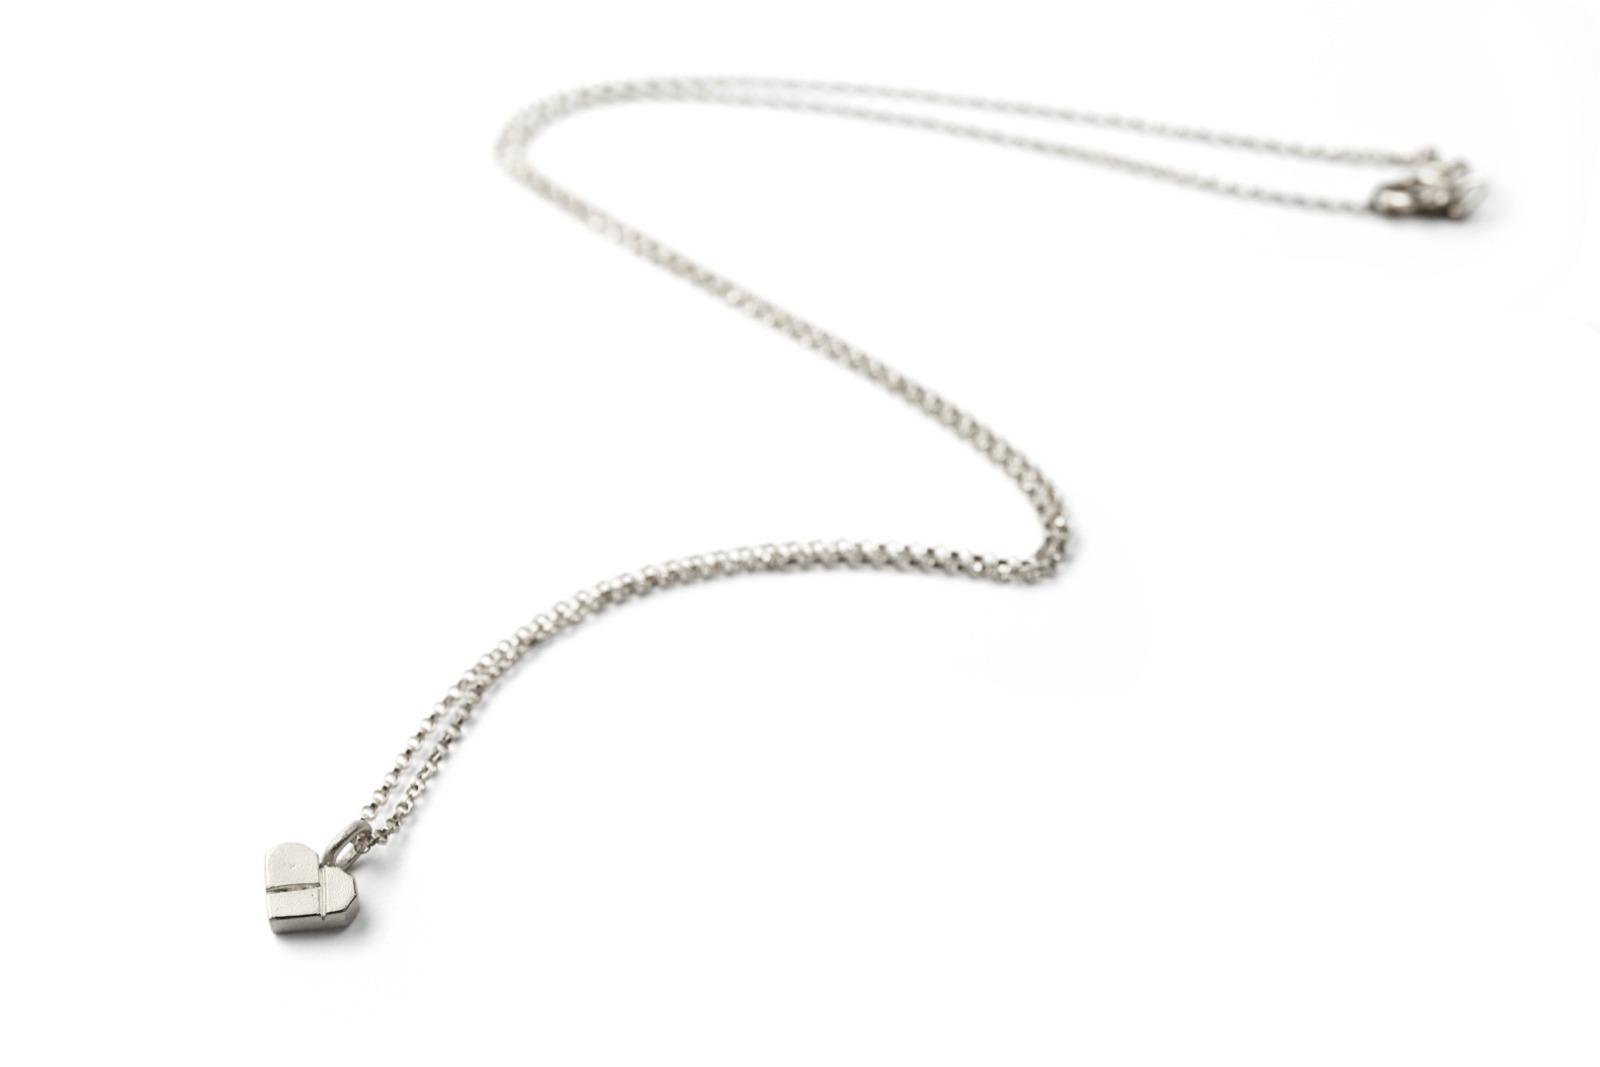 Tangram-Kette HERZCHEN 925 Silber